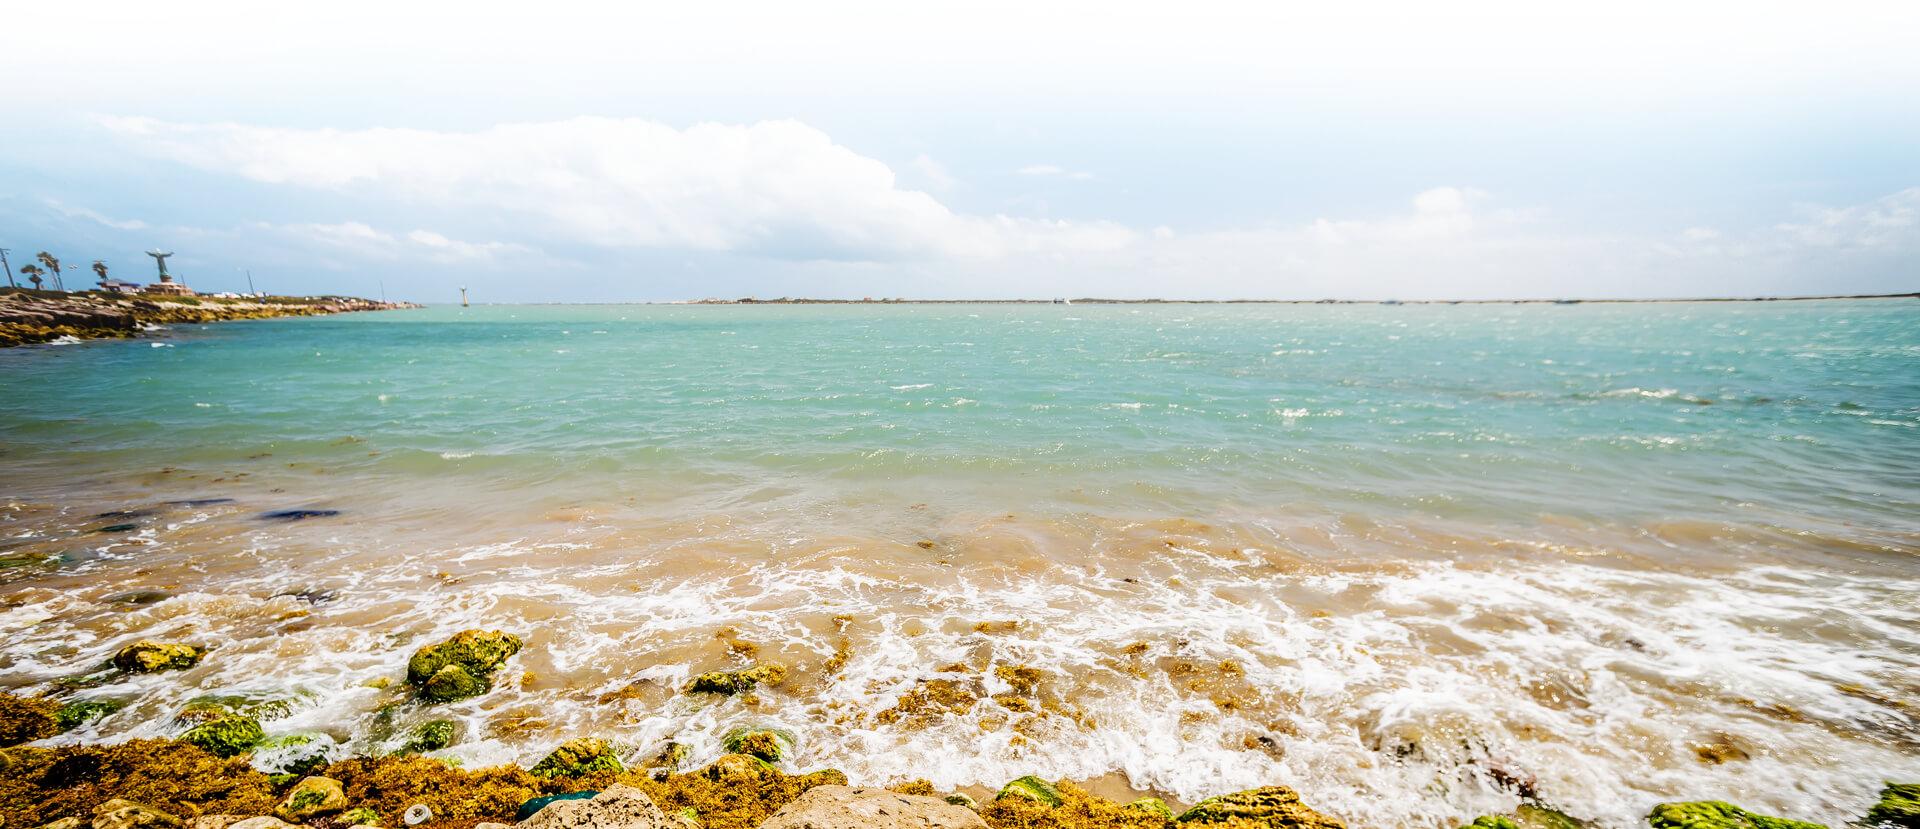 South Padre Island beachfront